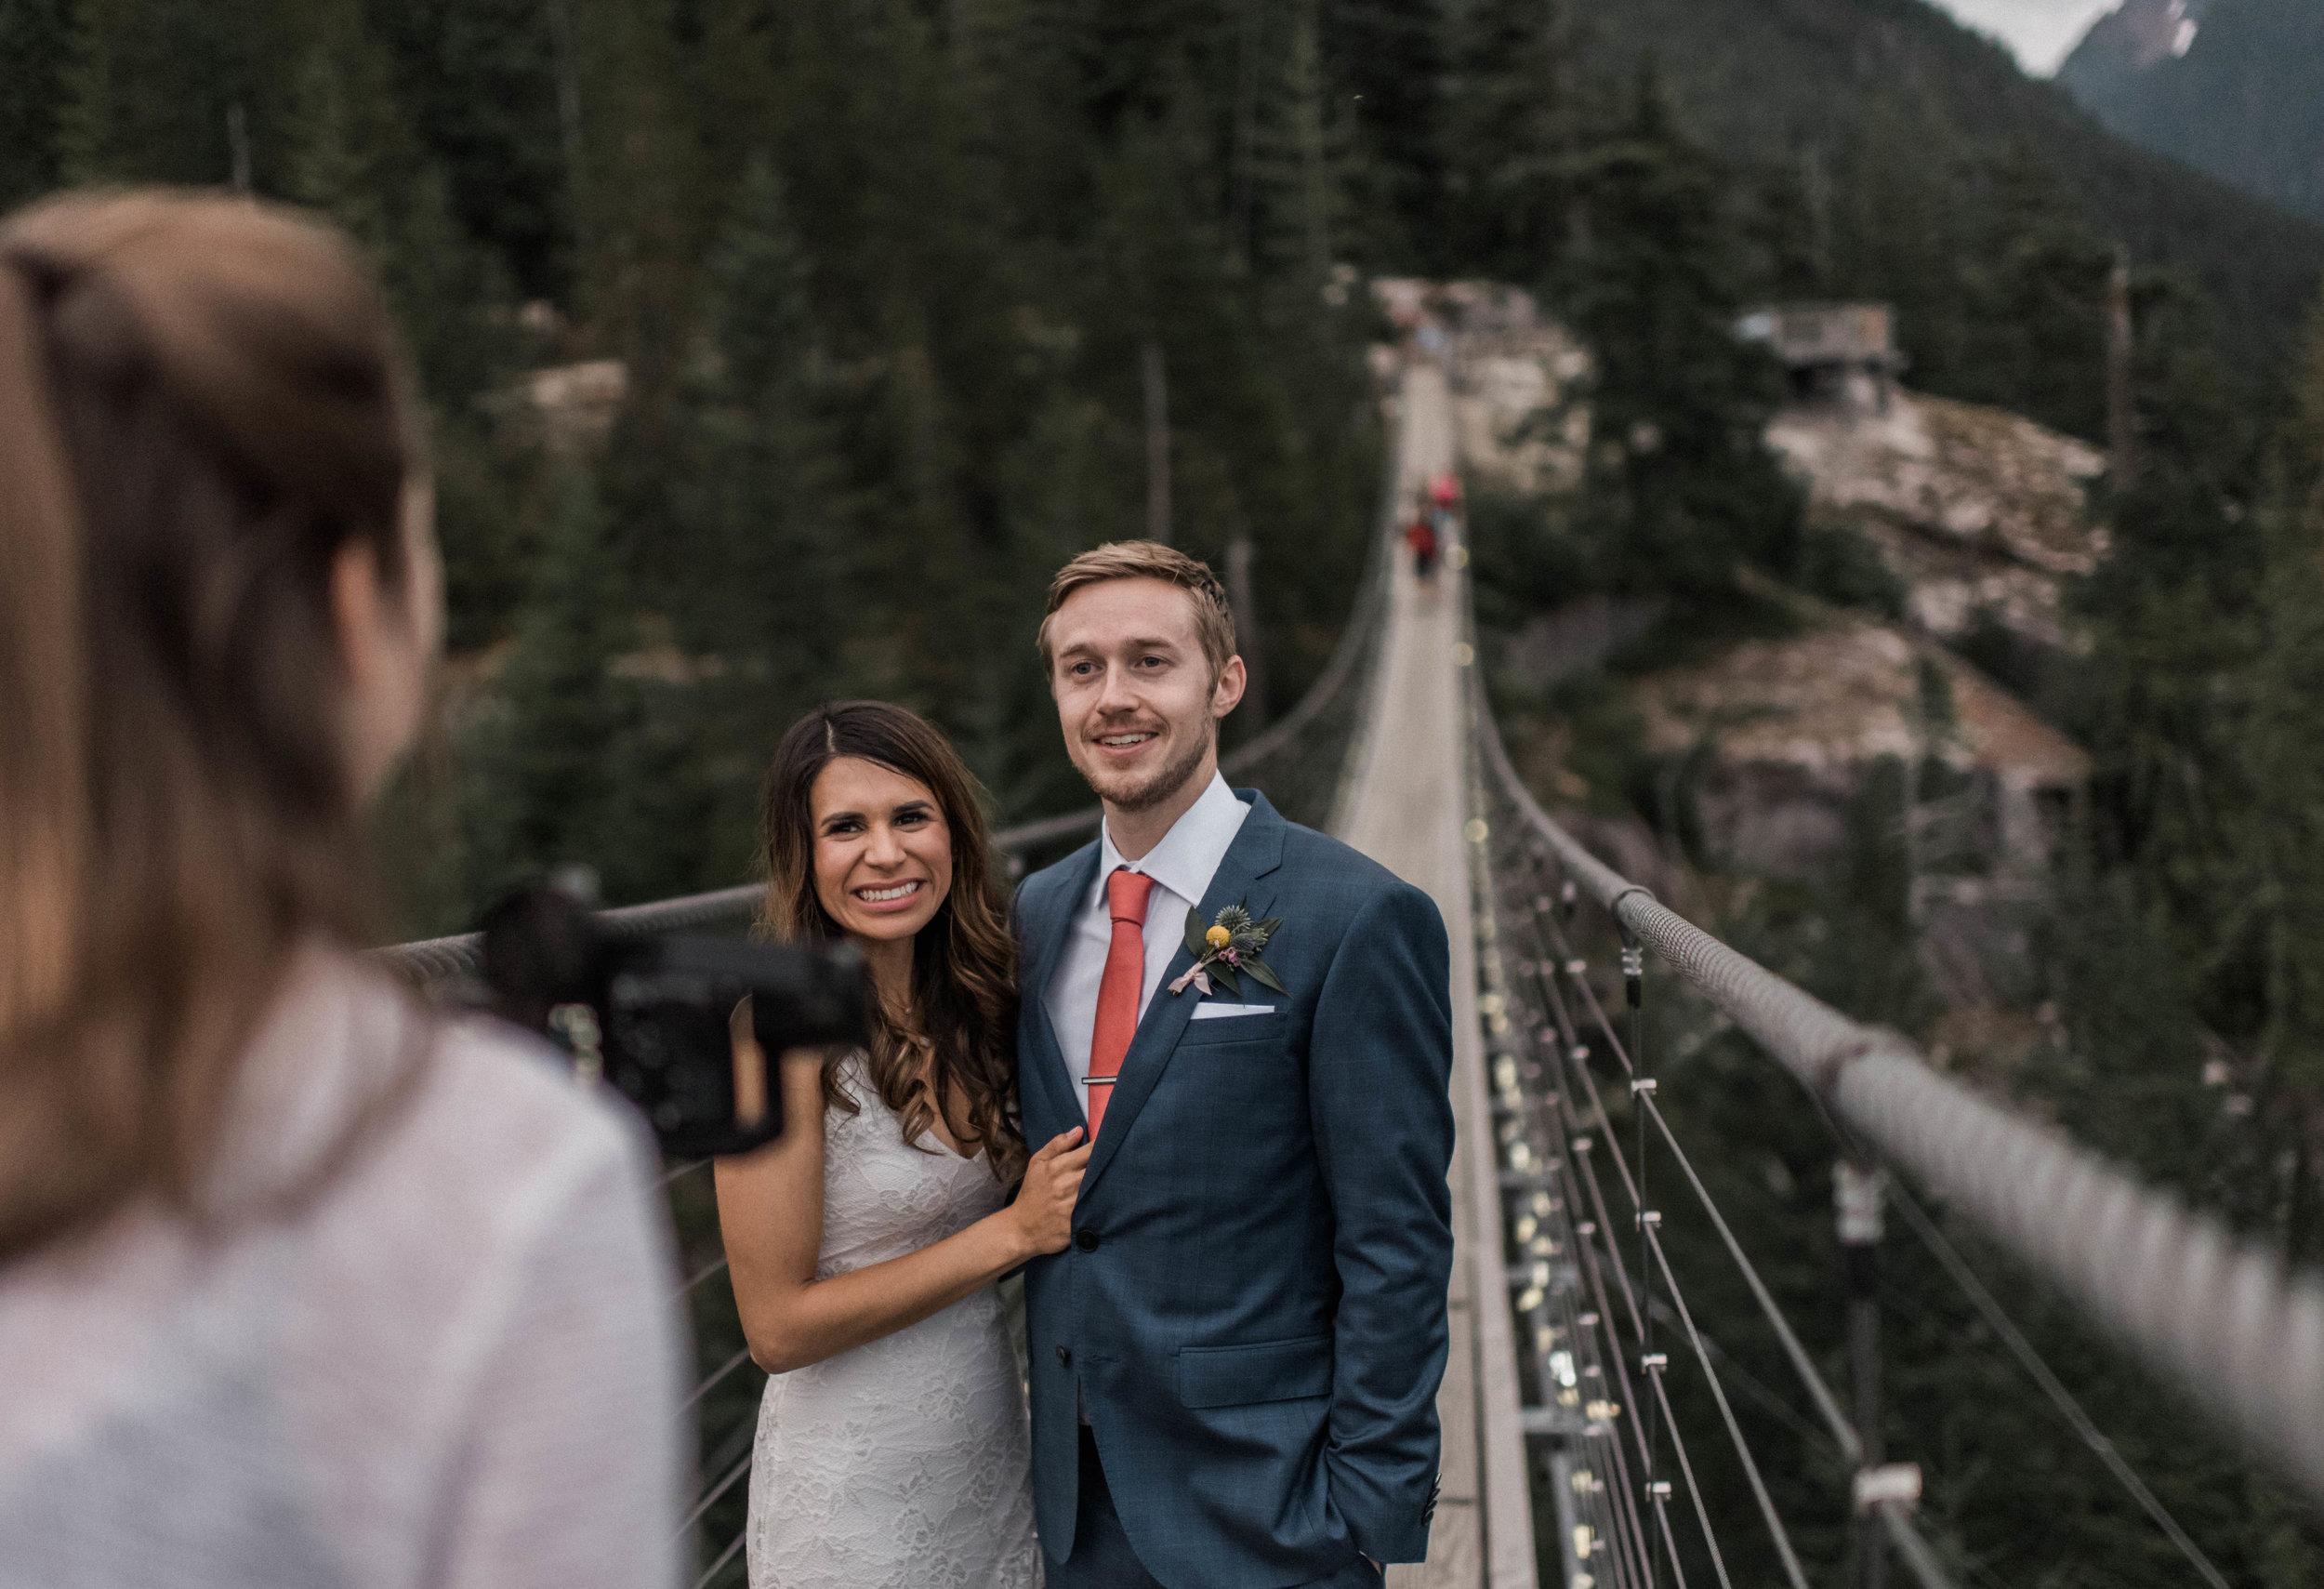 austin-texas-wedding-photography-1778-photographie-99.jpg